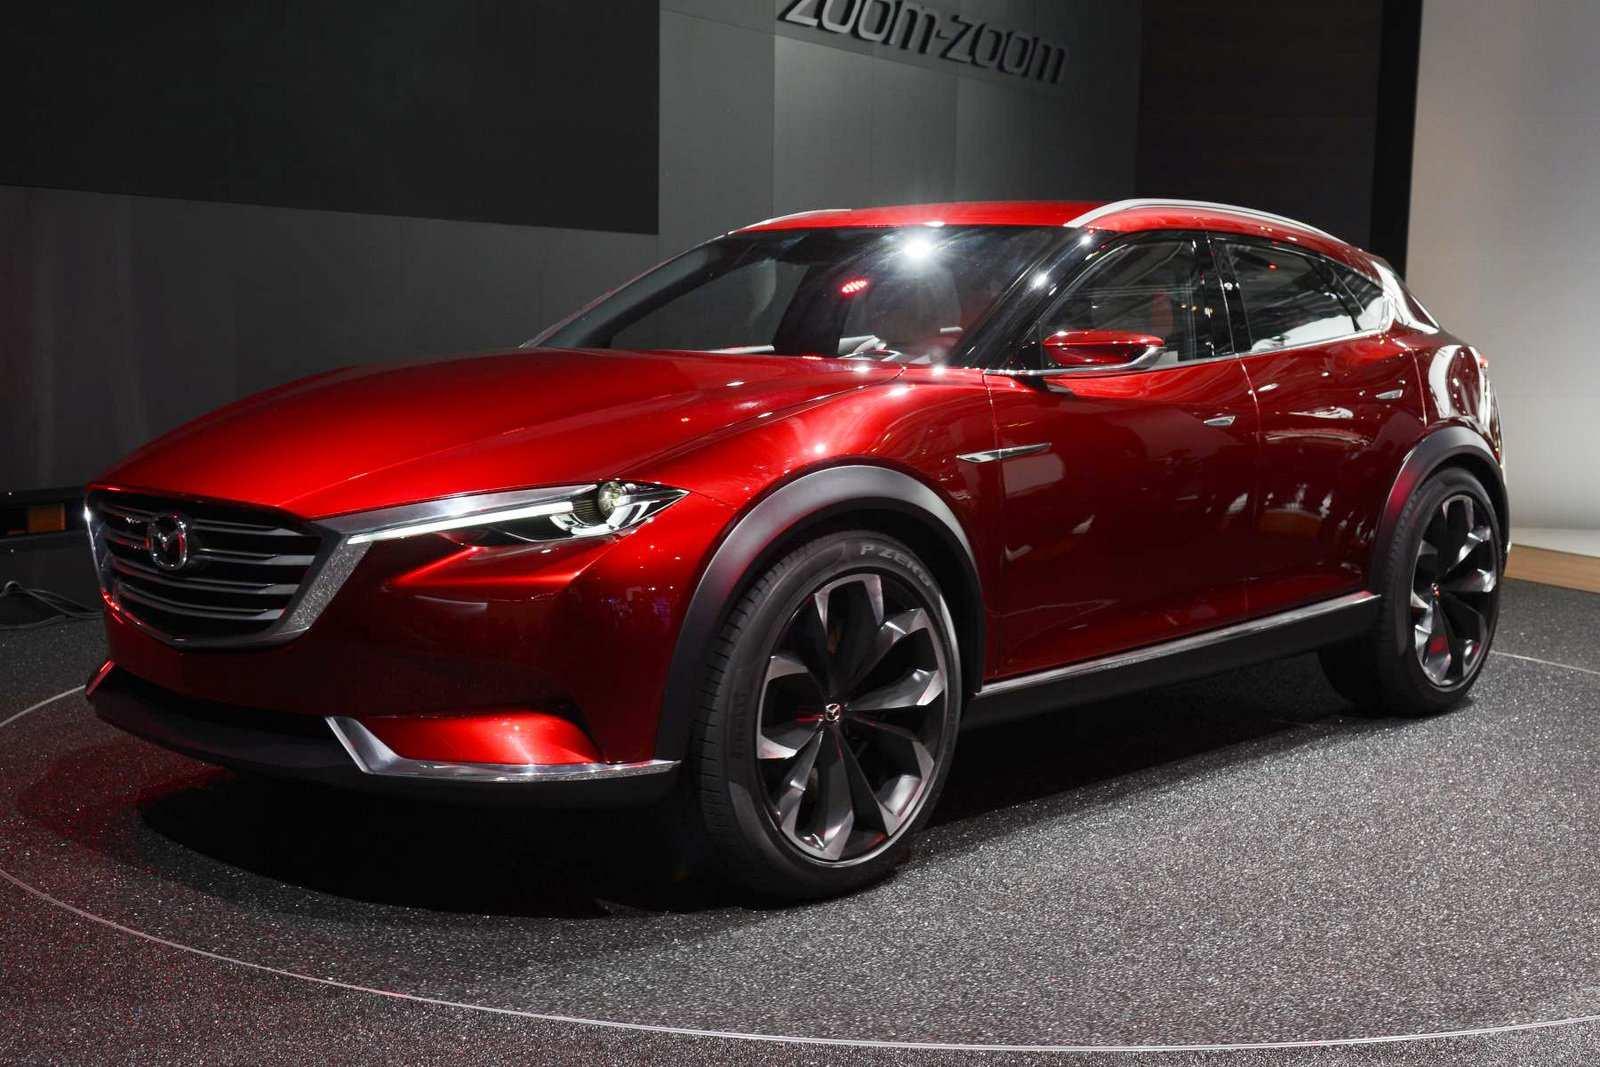 68 Great Mazda X3 2020 Model with Mazda X3 2020